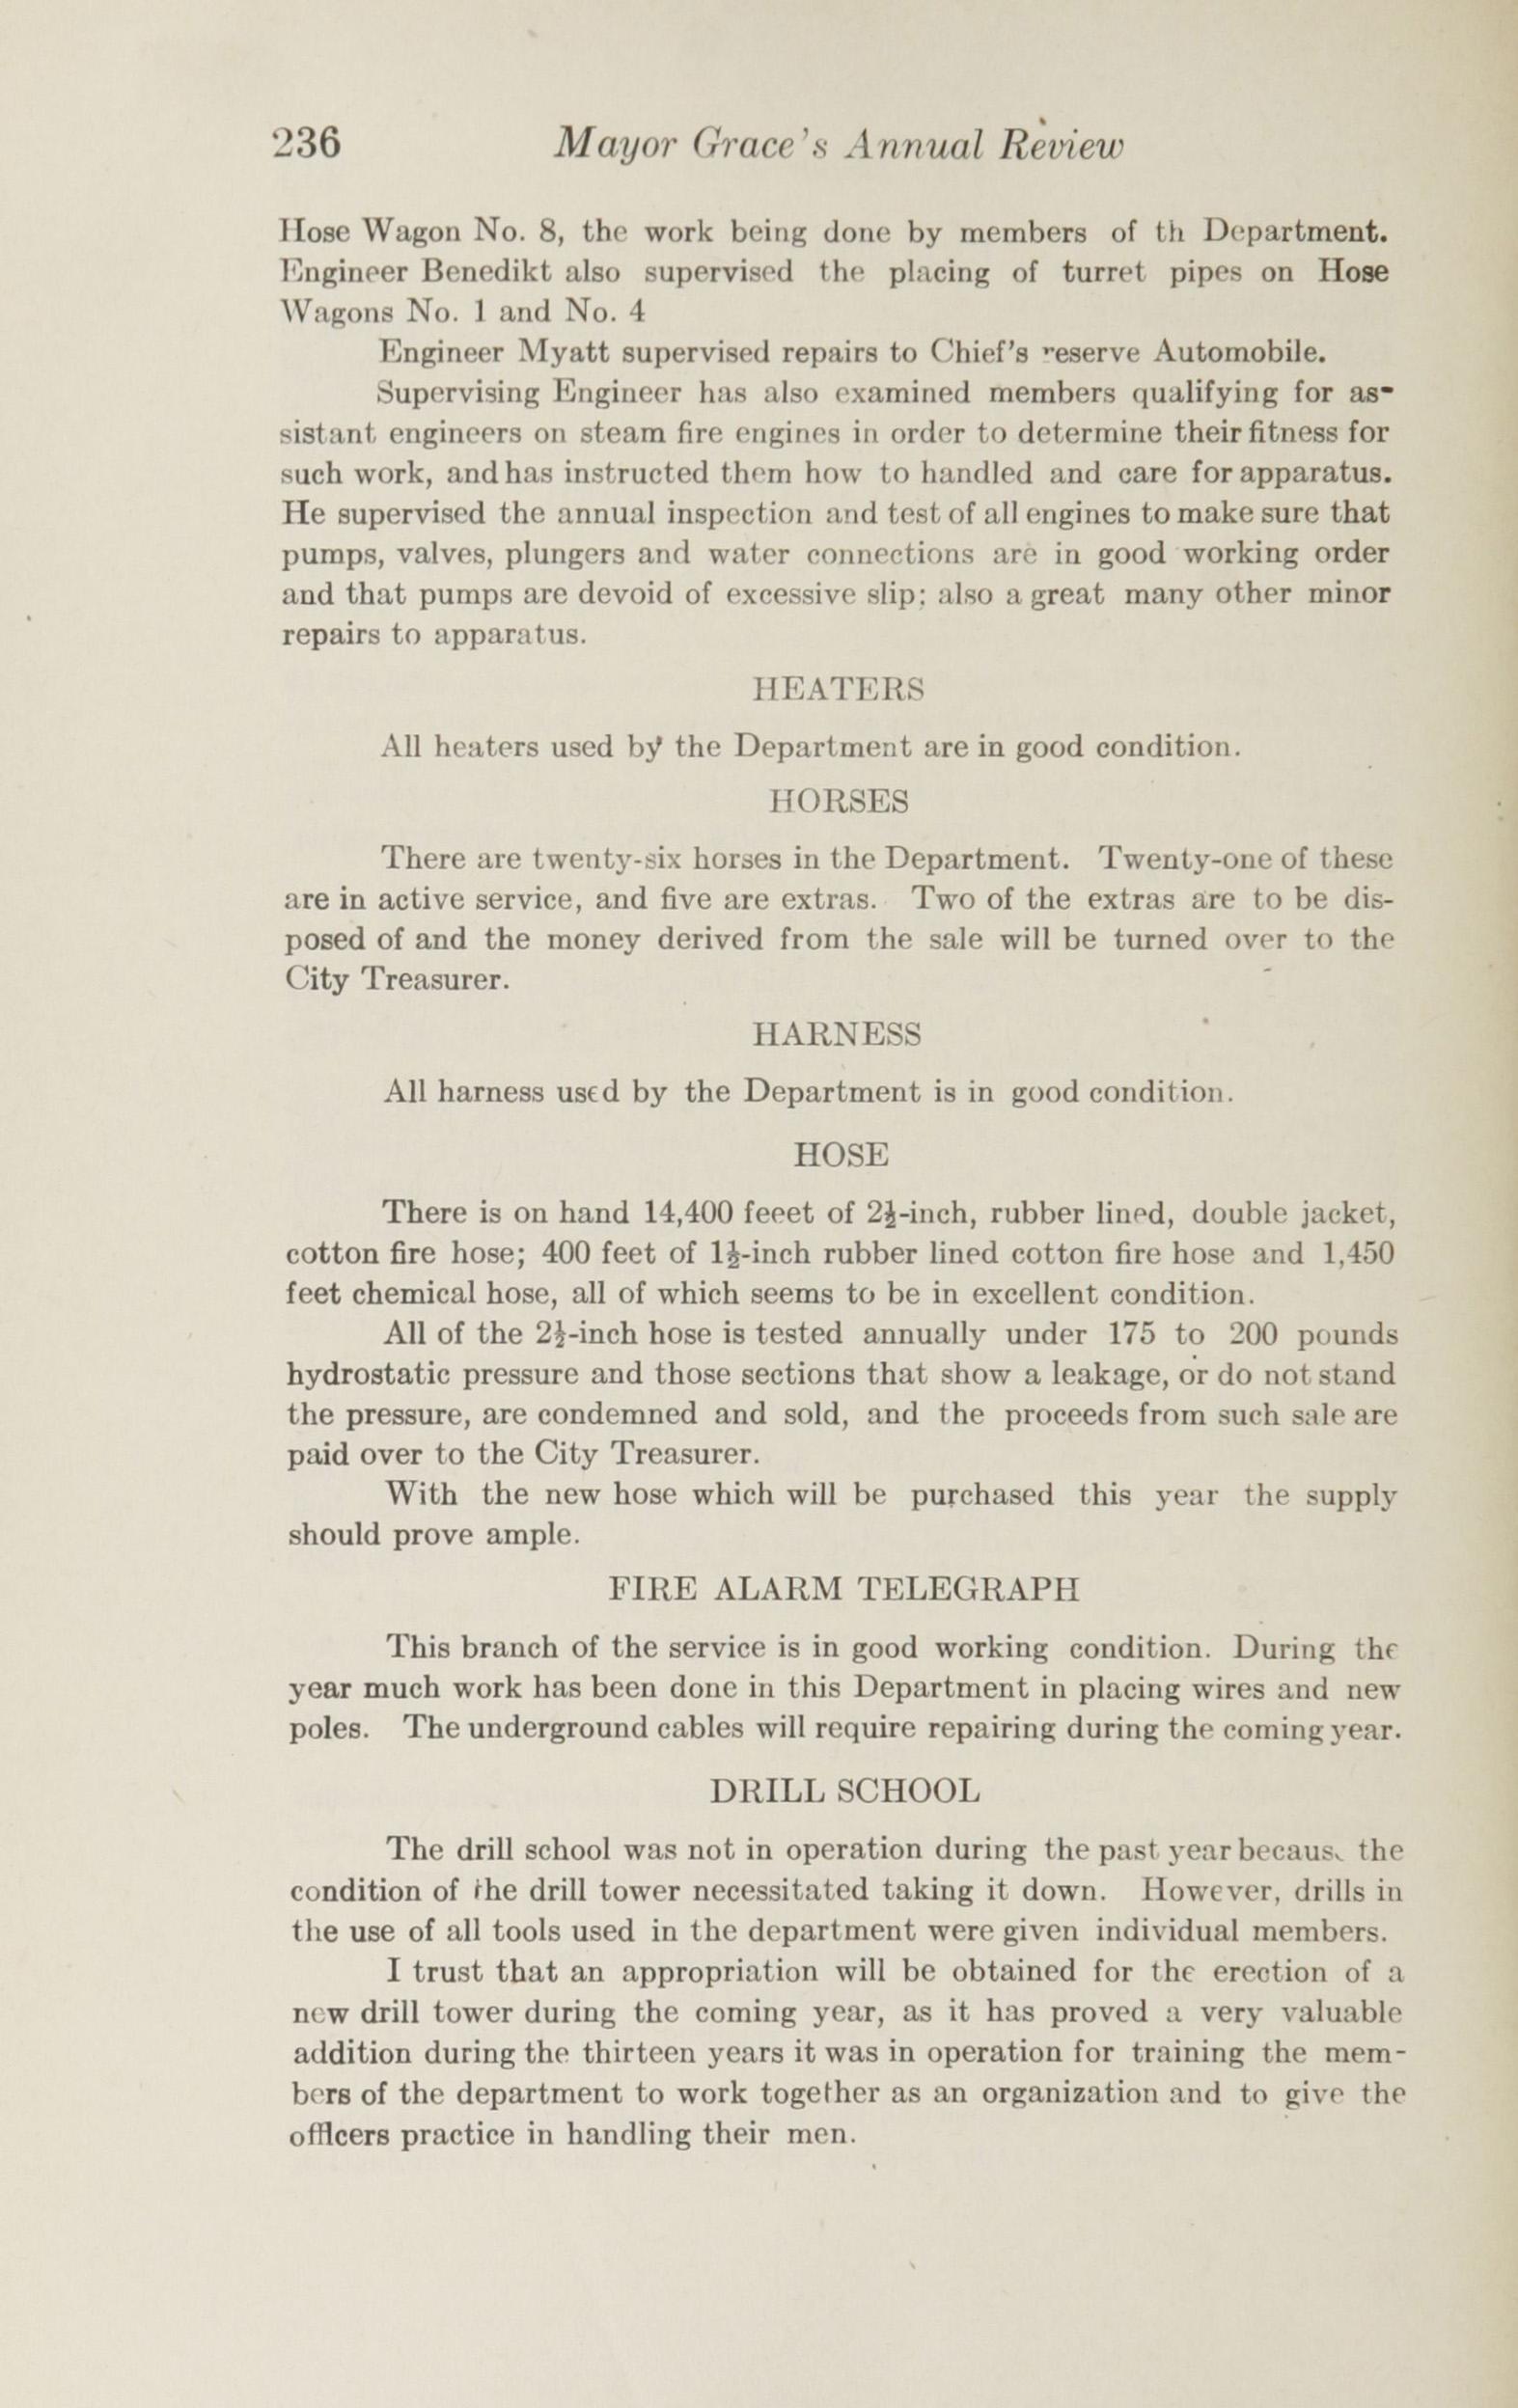 Charleston Yearbook, 1915, page 236